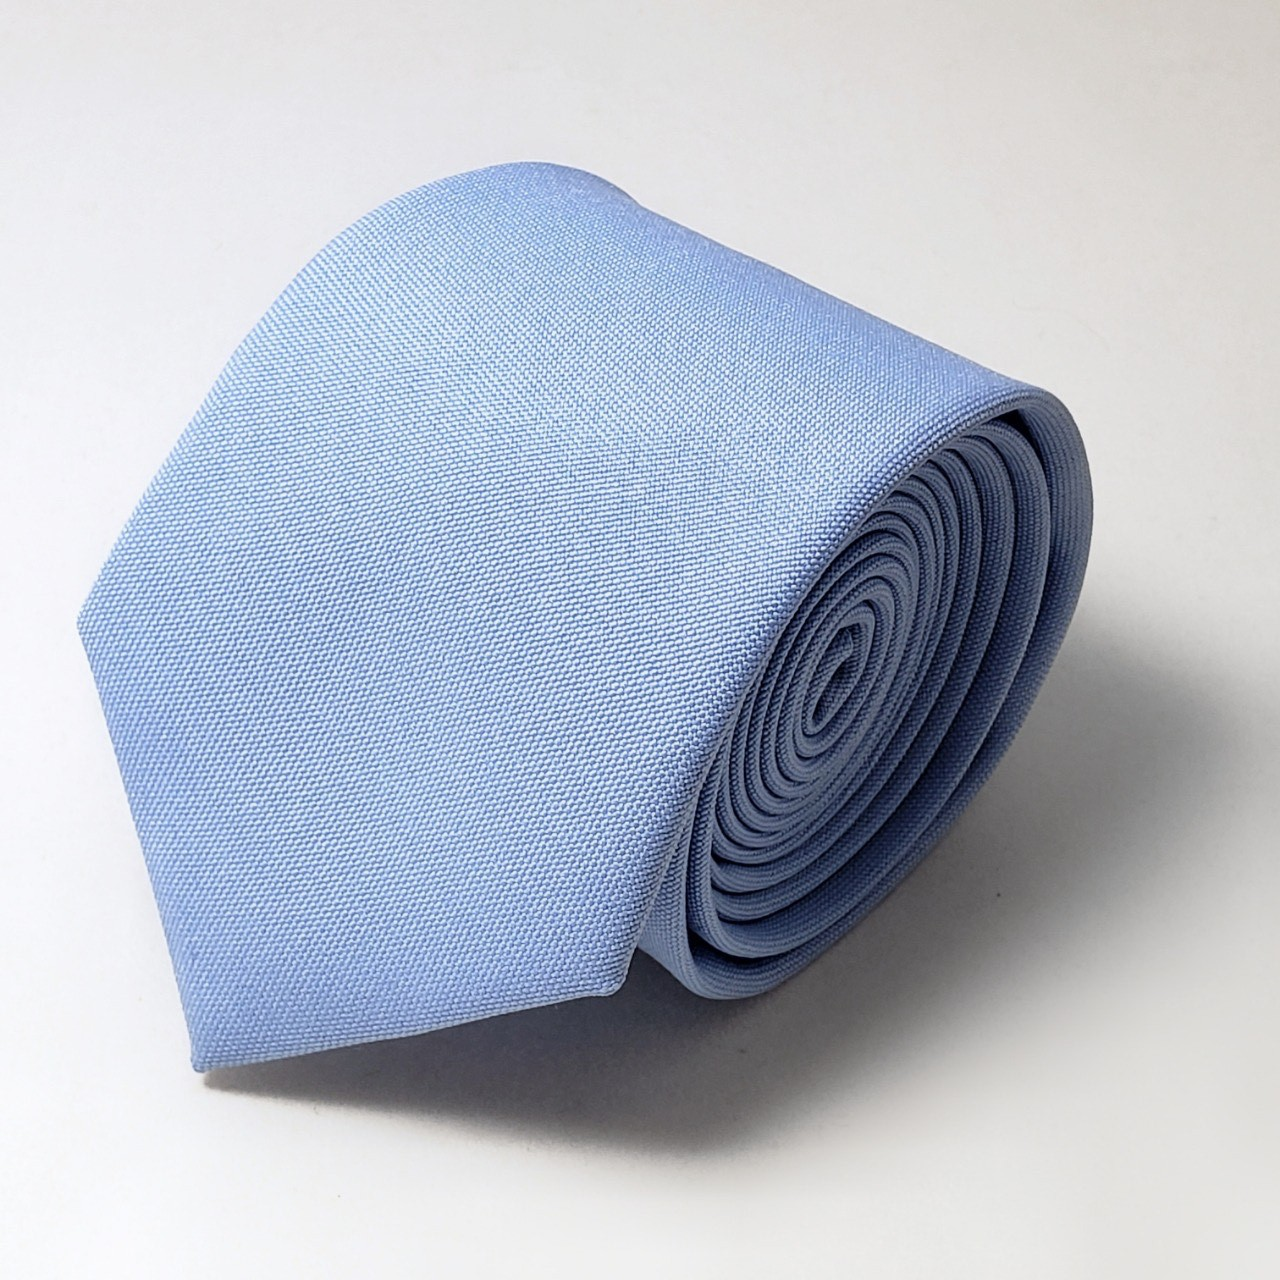 Gravata Azul serenity lisa fosca semi slin